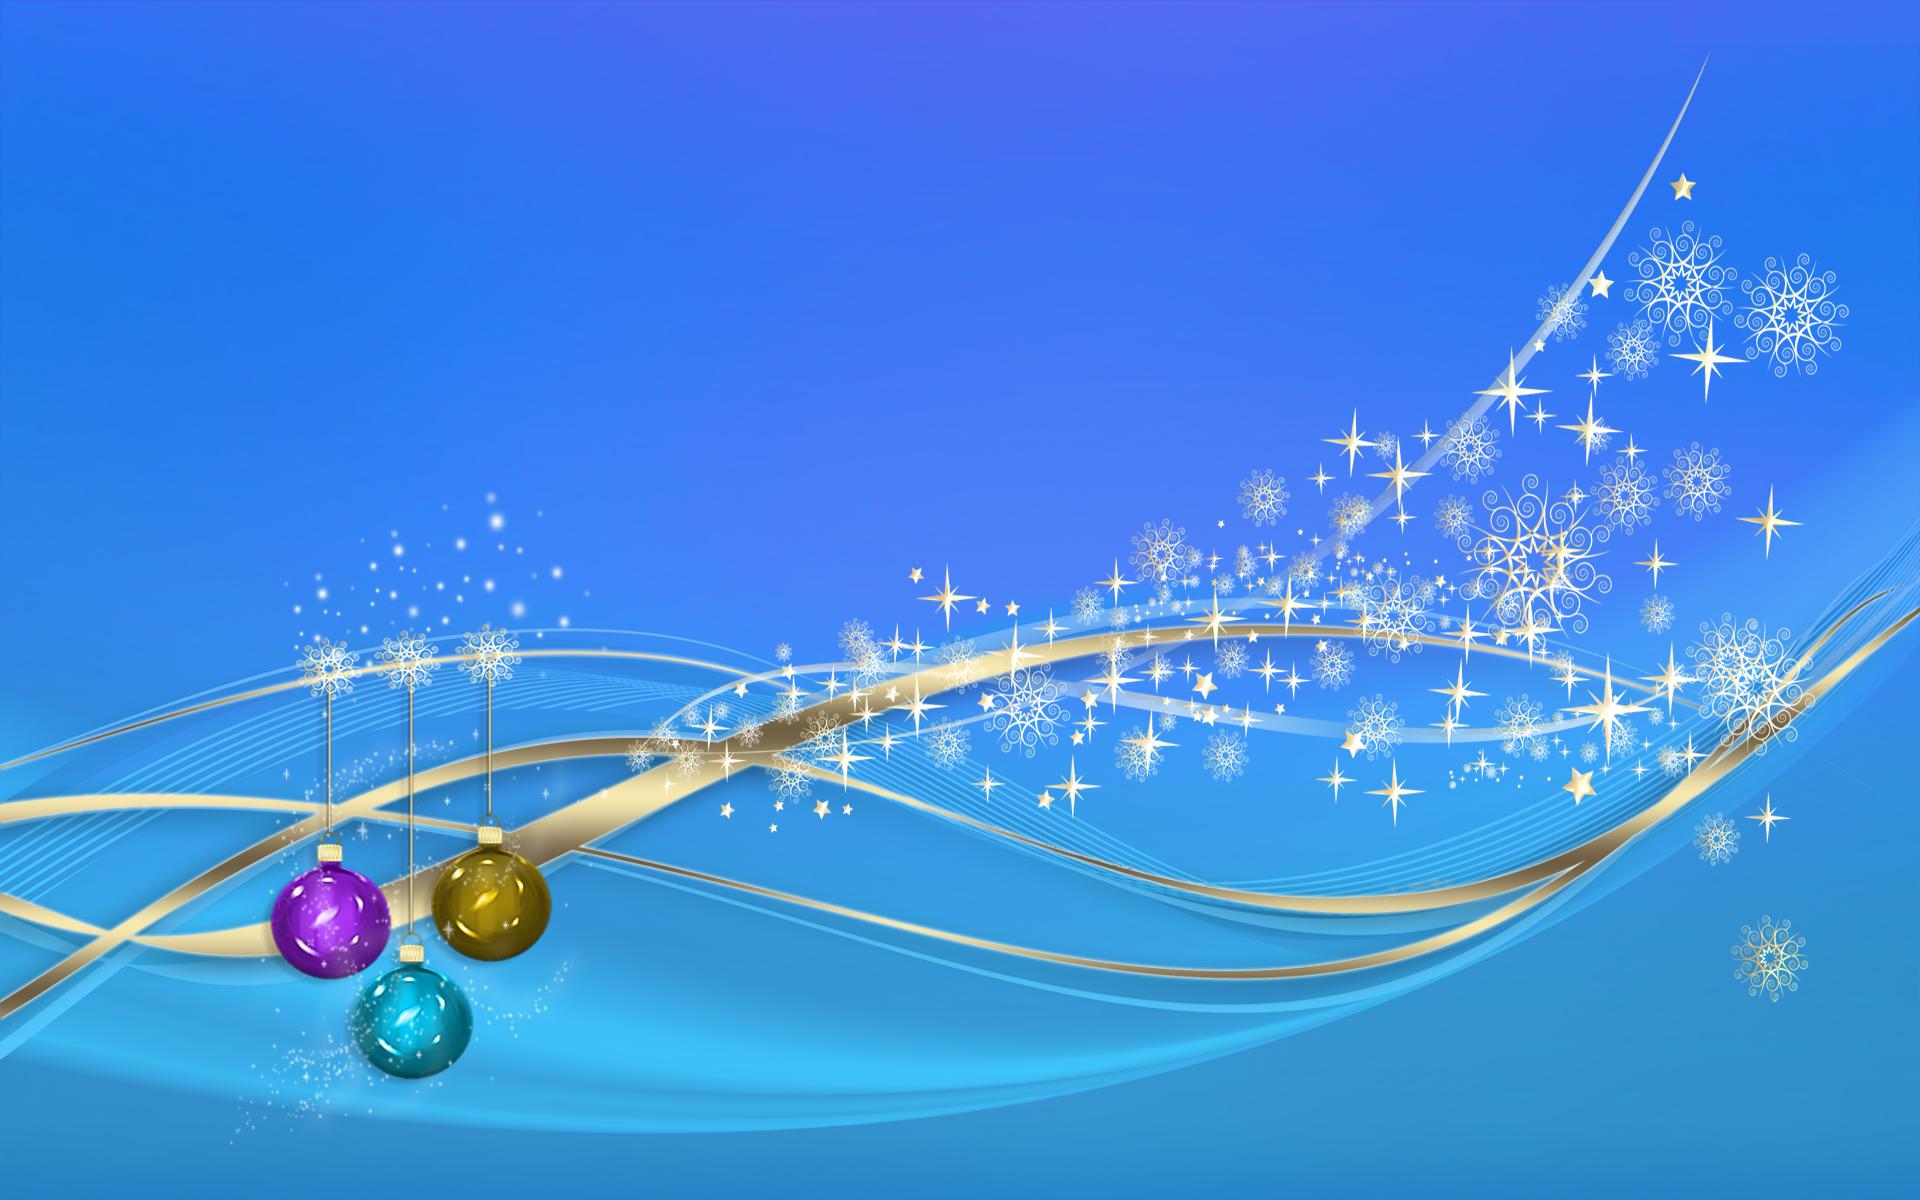 Blue Christmas Background hd Christmas Explore Blue hd